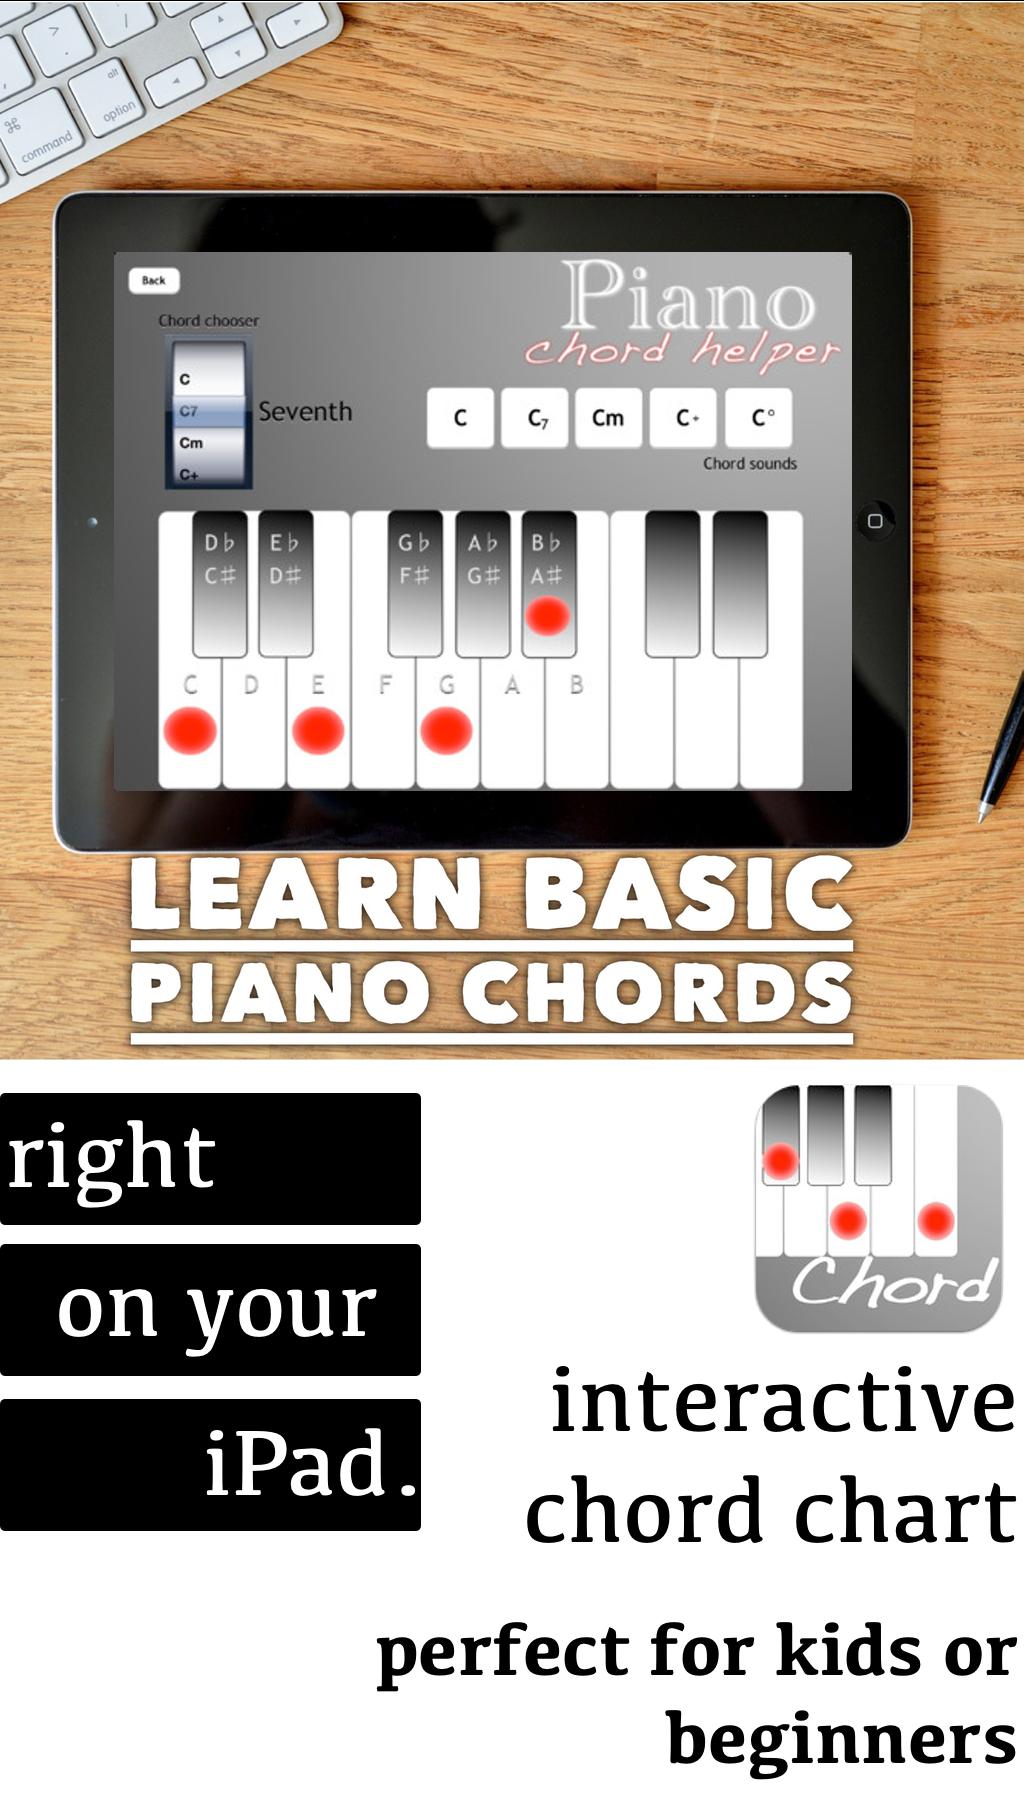 Piano Chord Helper is an app designed to help teach kids